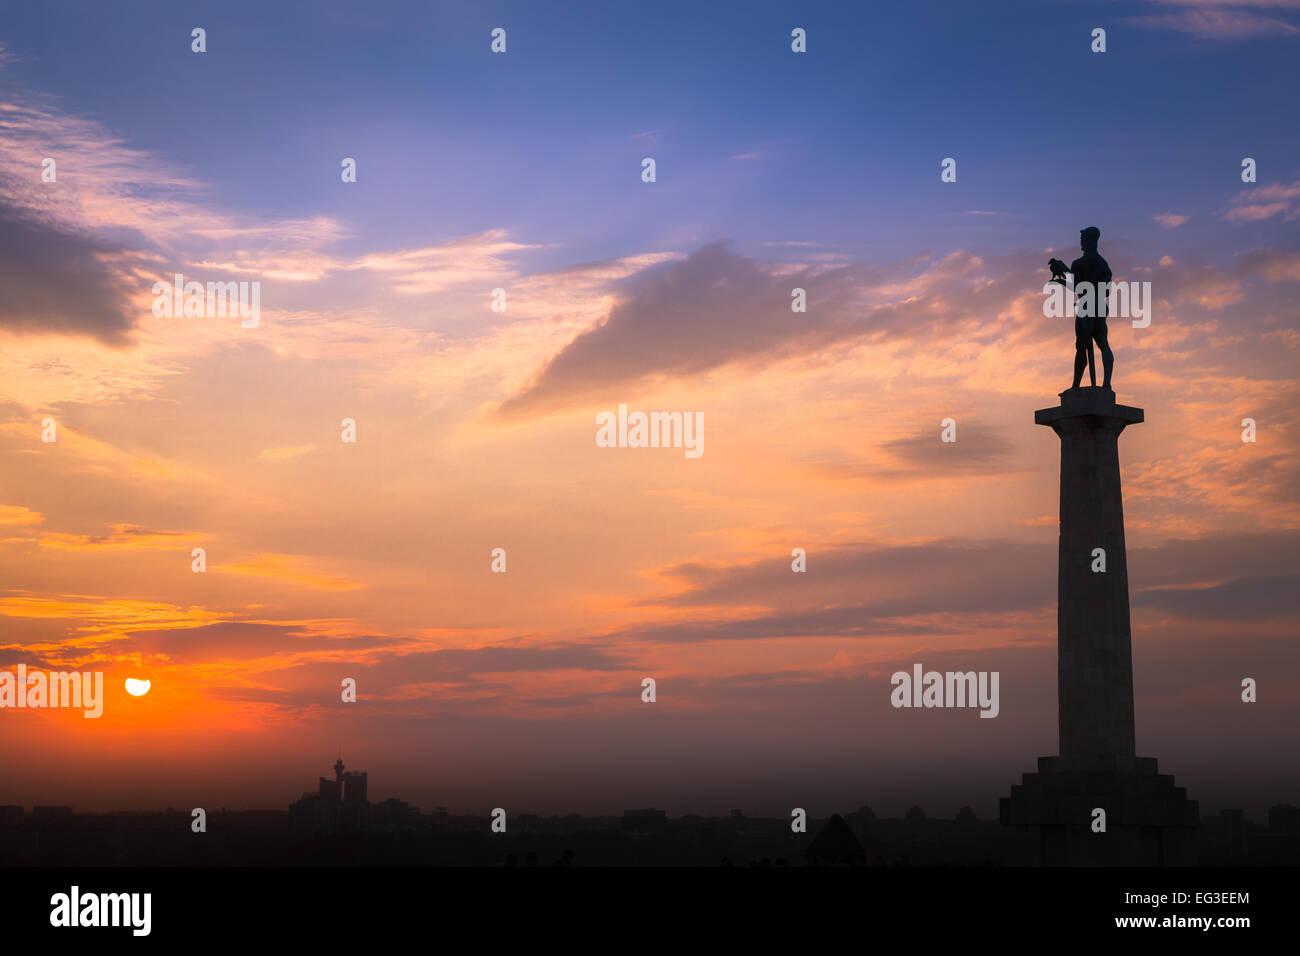 sunset at pobednik the victor monument by Ivan Meštrović in kalemegdan belgrade serbia. the statue overlooks the - Stock Image